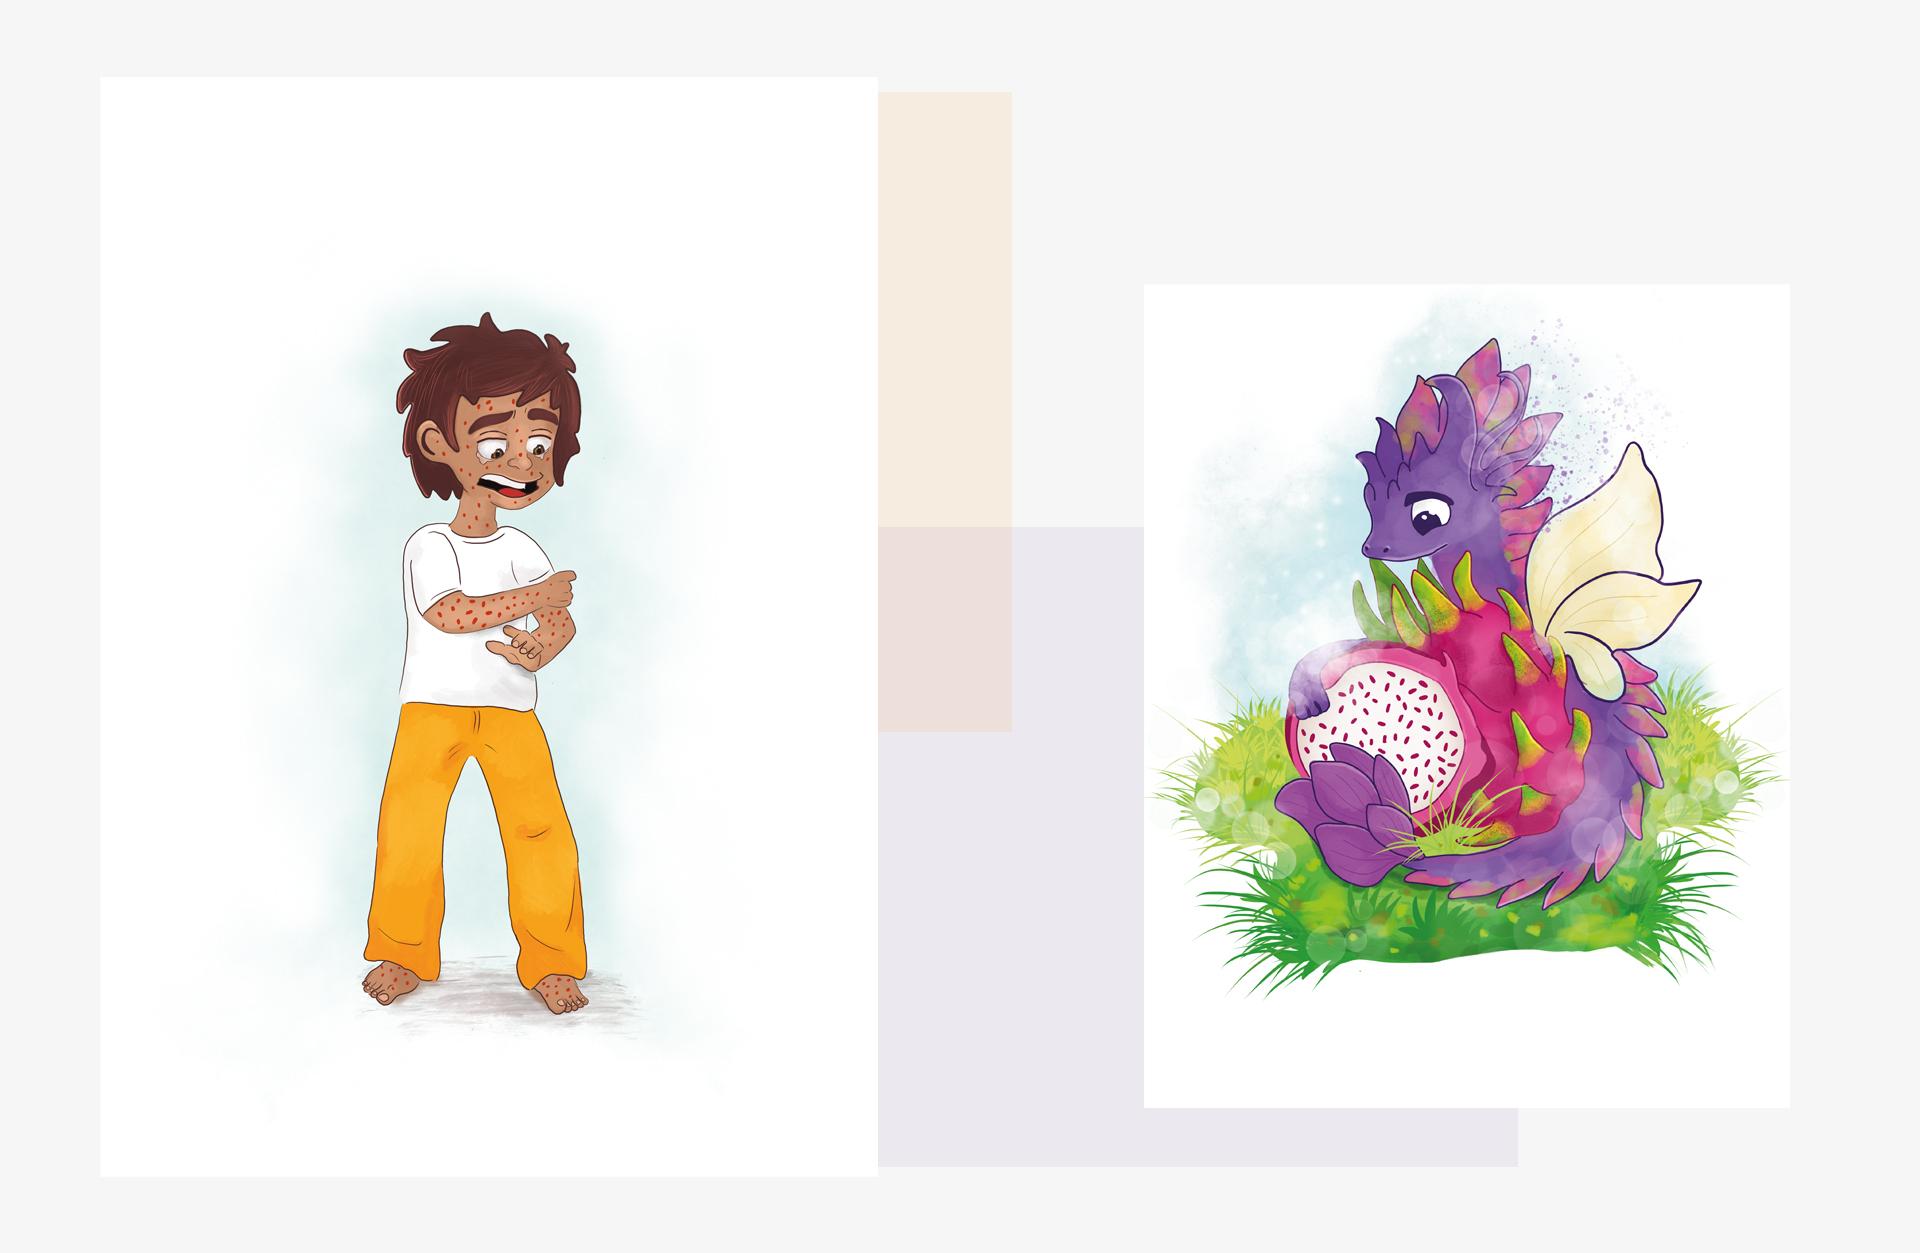 Dragon fruit and a boy